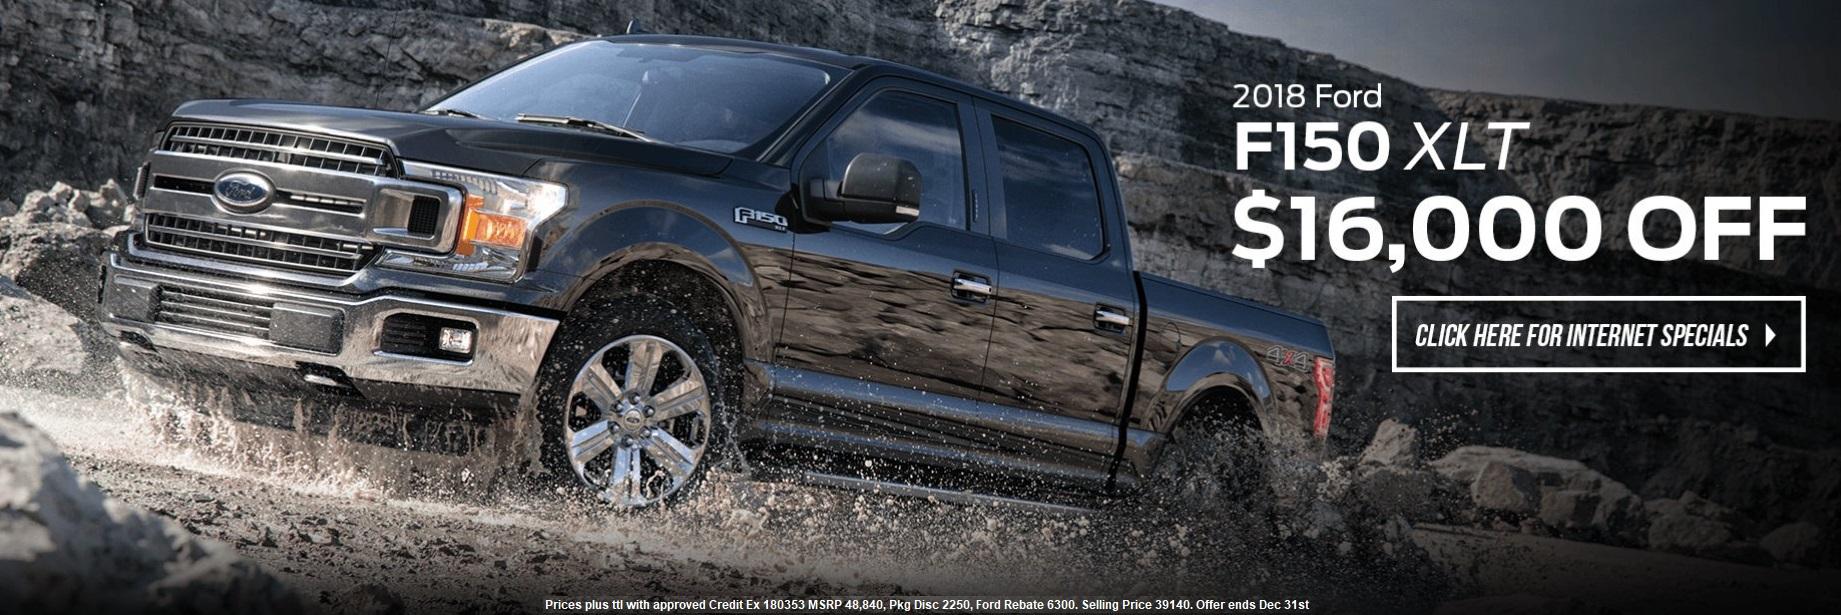 New Used Ford Dealer In Georgetown Tx Mac Haik Lincoln Cadillac Srx Rear Fuse Box Go